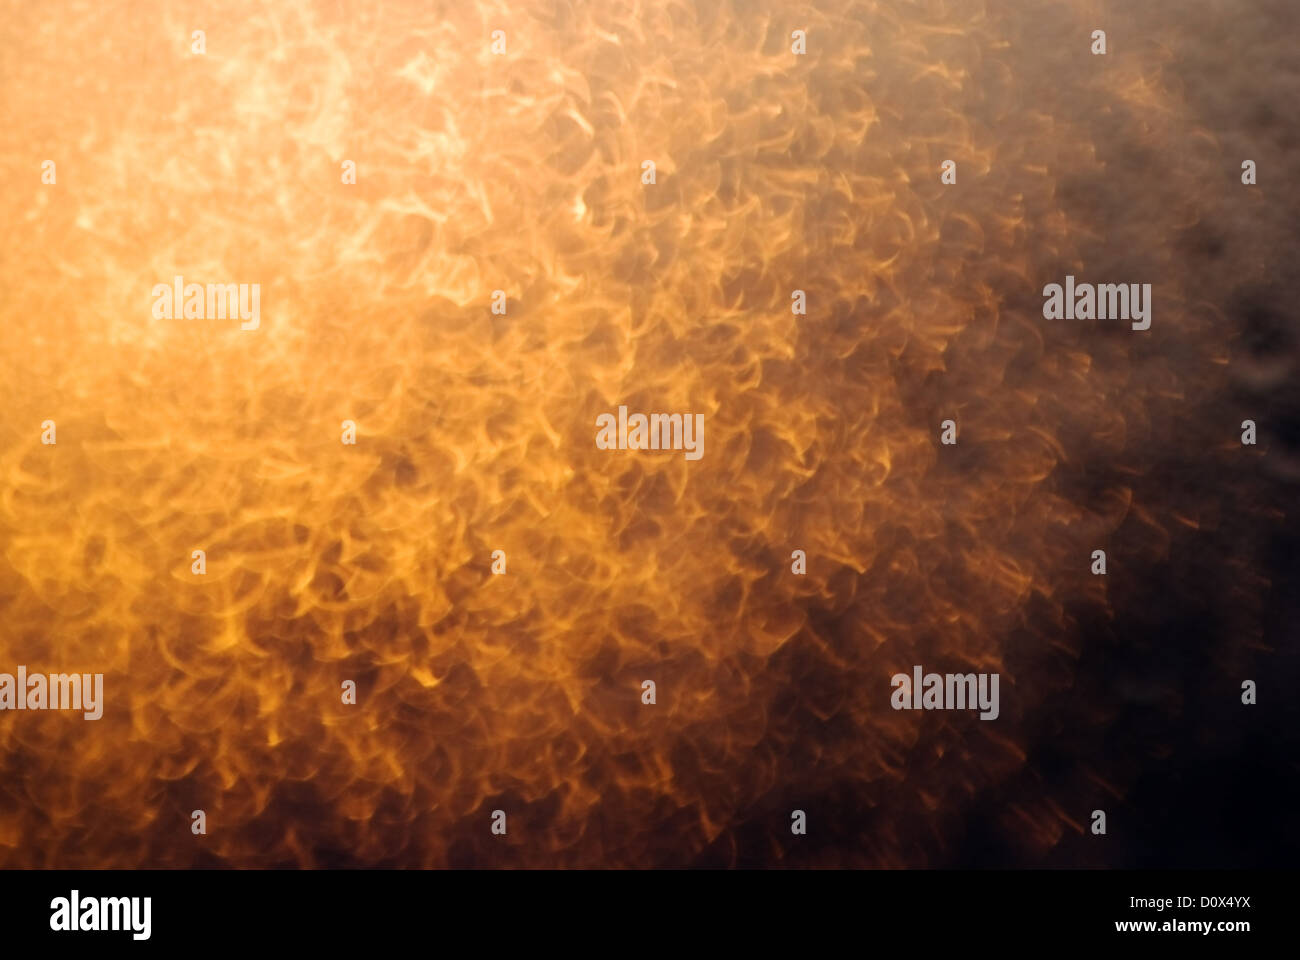 gold blured light - Stock Image